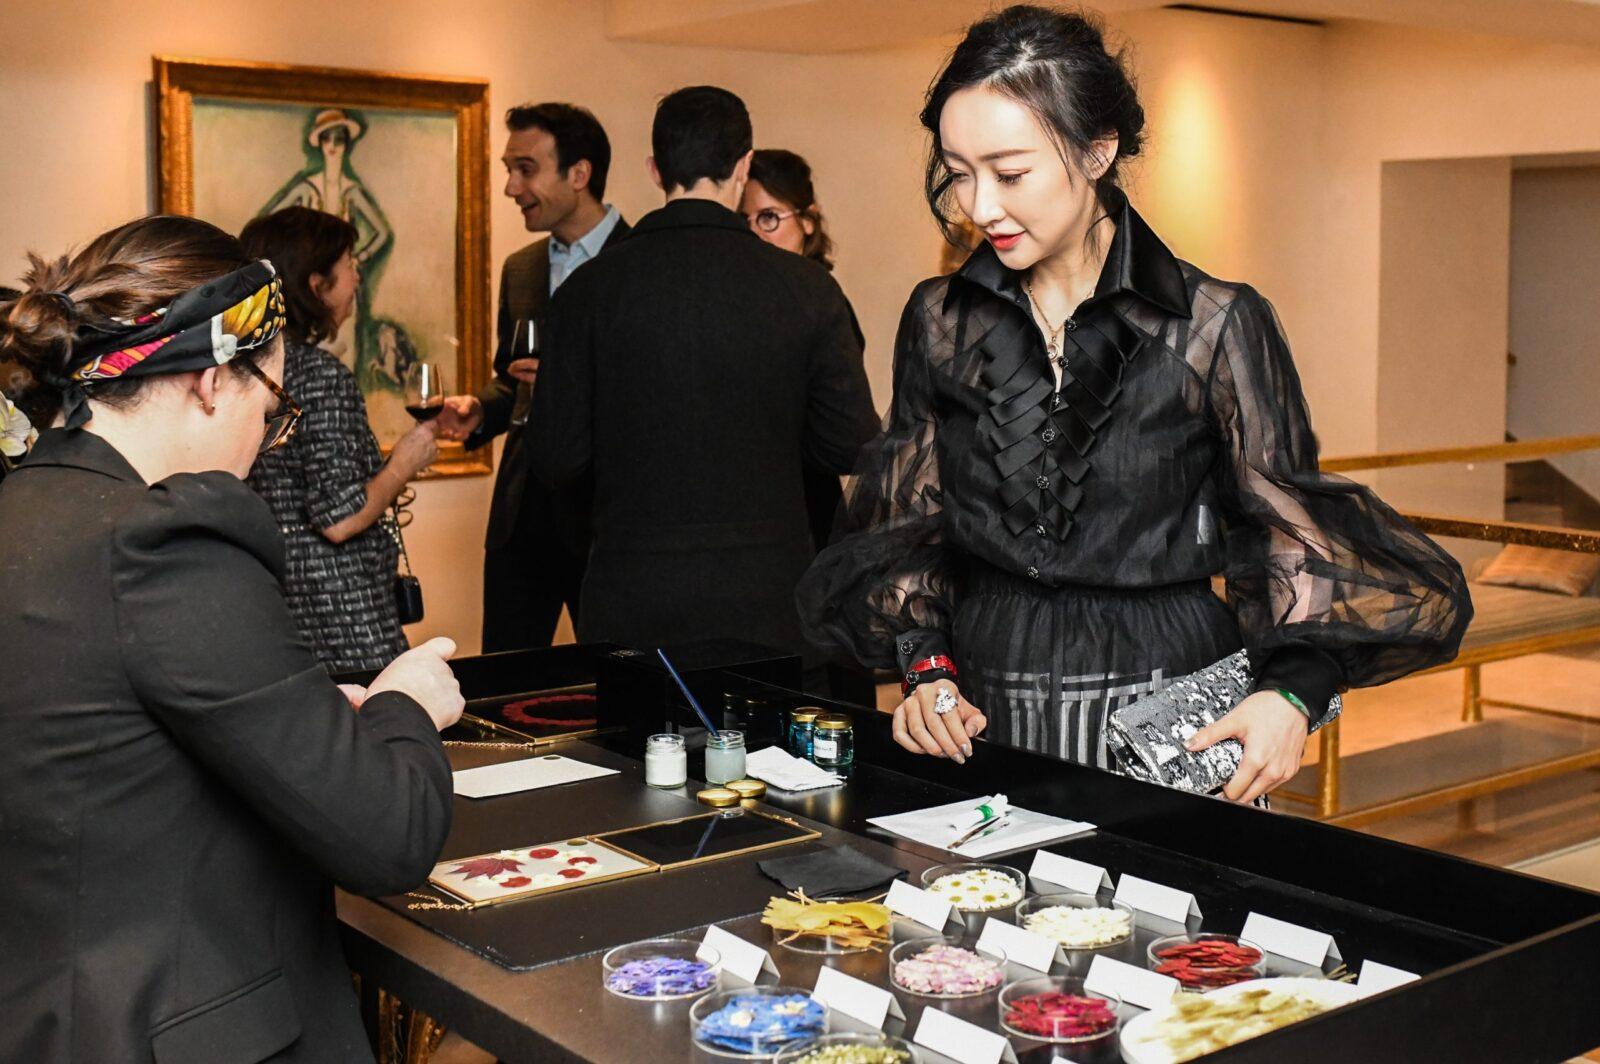 Chanel Fashion Week Aftershow - Caroline Bleux Photographe Paris